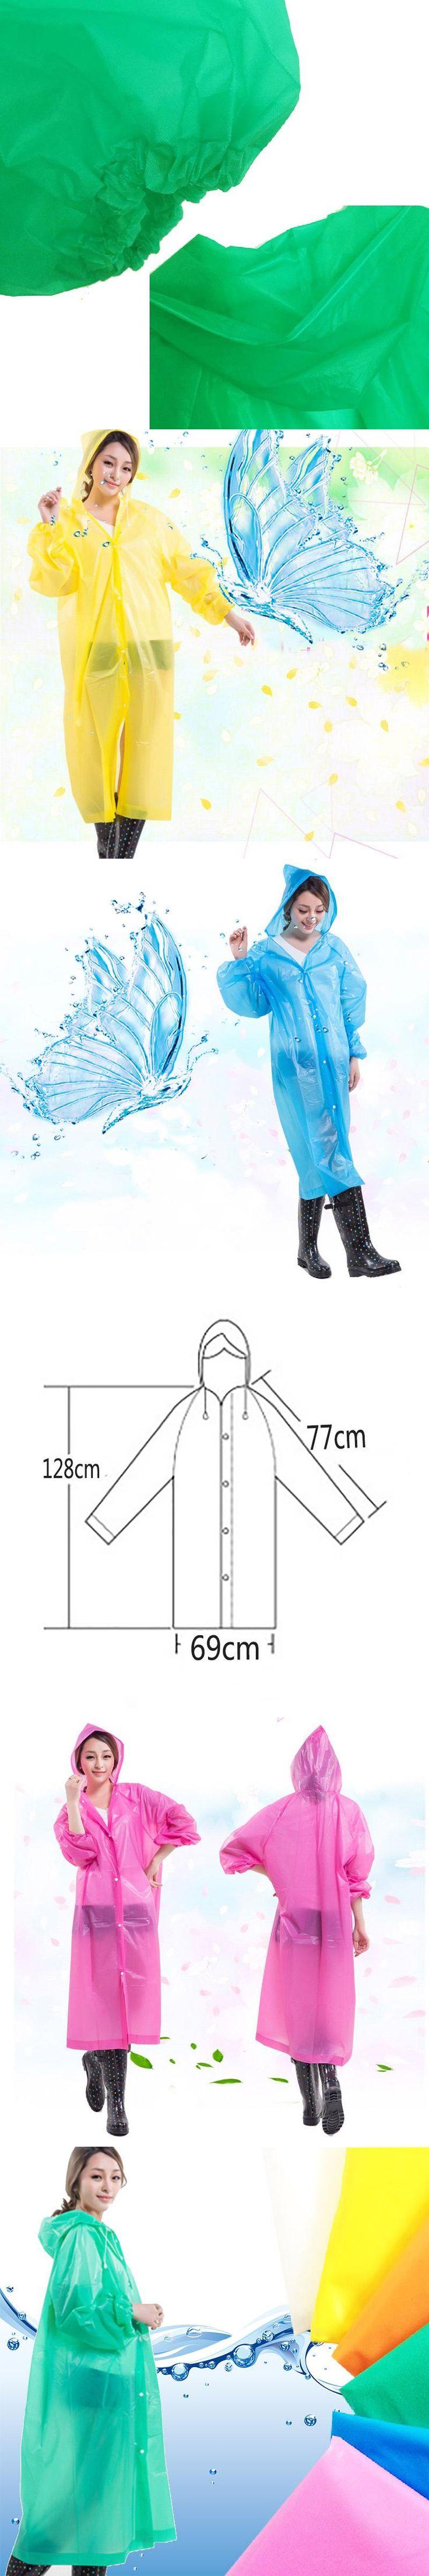 Women Raincoat Rain Cover Waterproof Transparent Raincoats Cloak Poncho Impermeable Cycling Rain Coat Rainwear Capa de Chuva